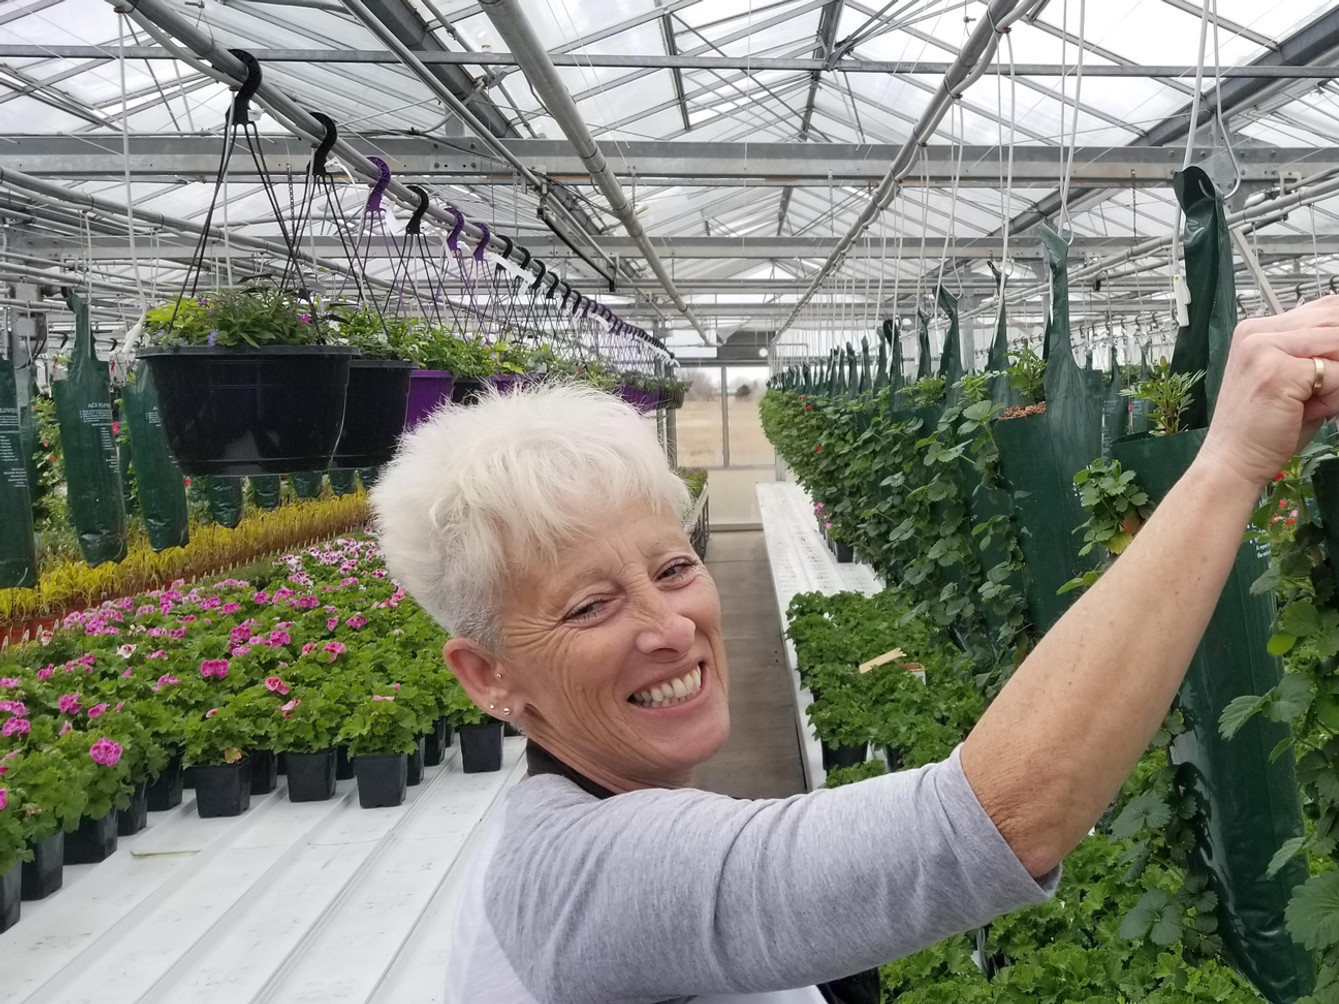 Strawberries, Thiel's Greenhouses